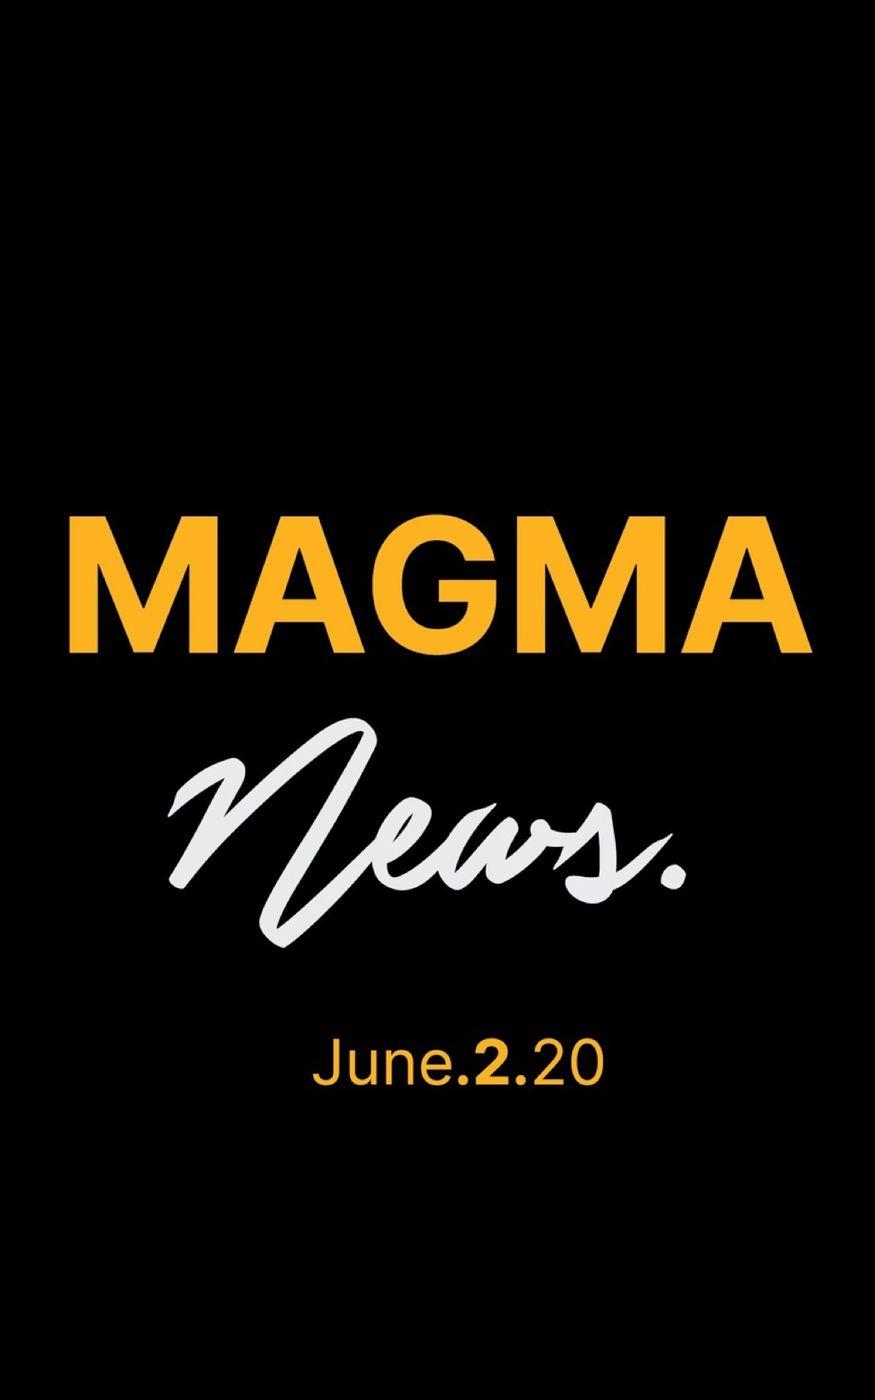 Magma News  June 2, 2020